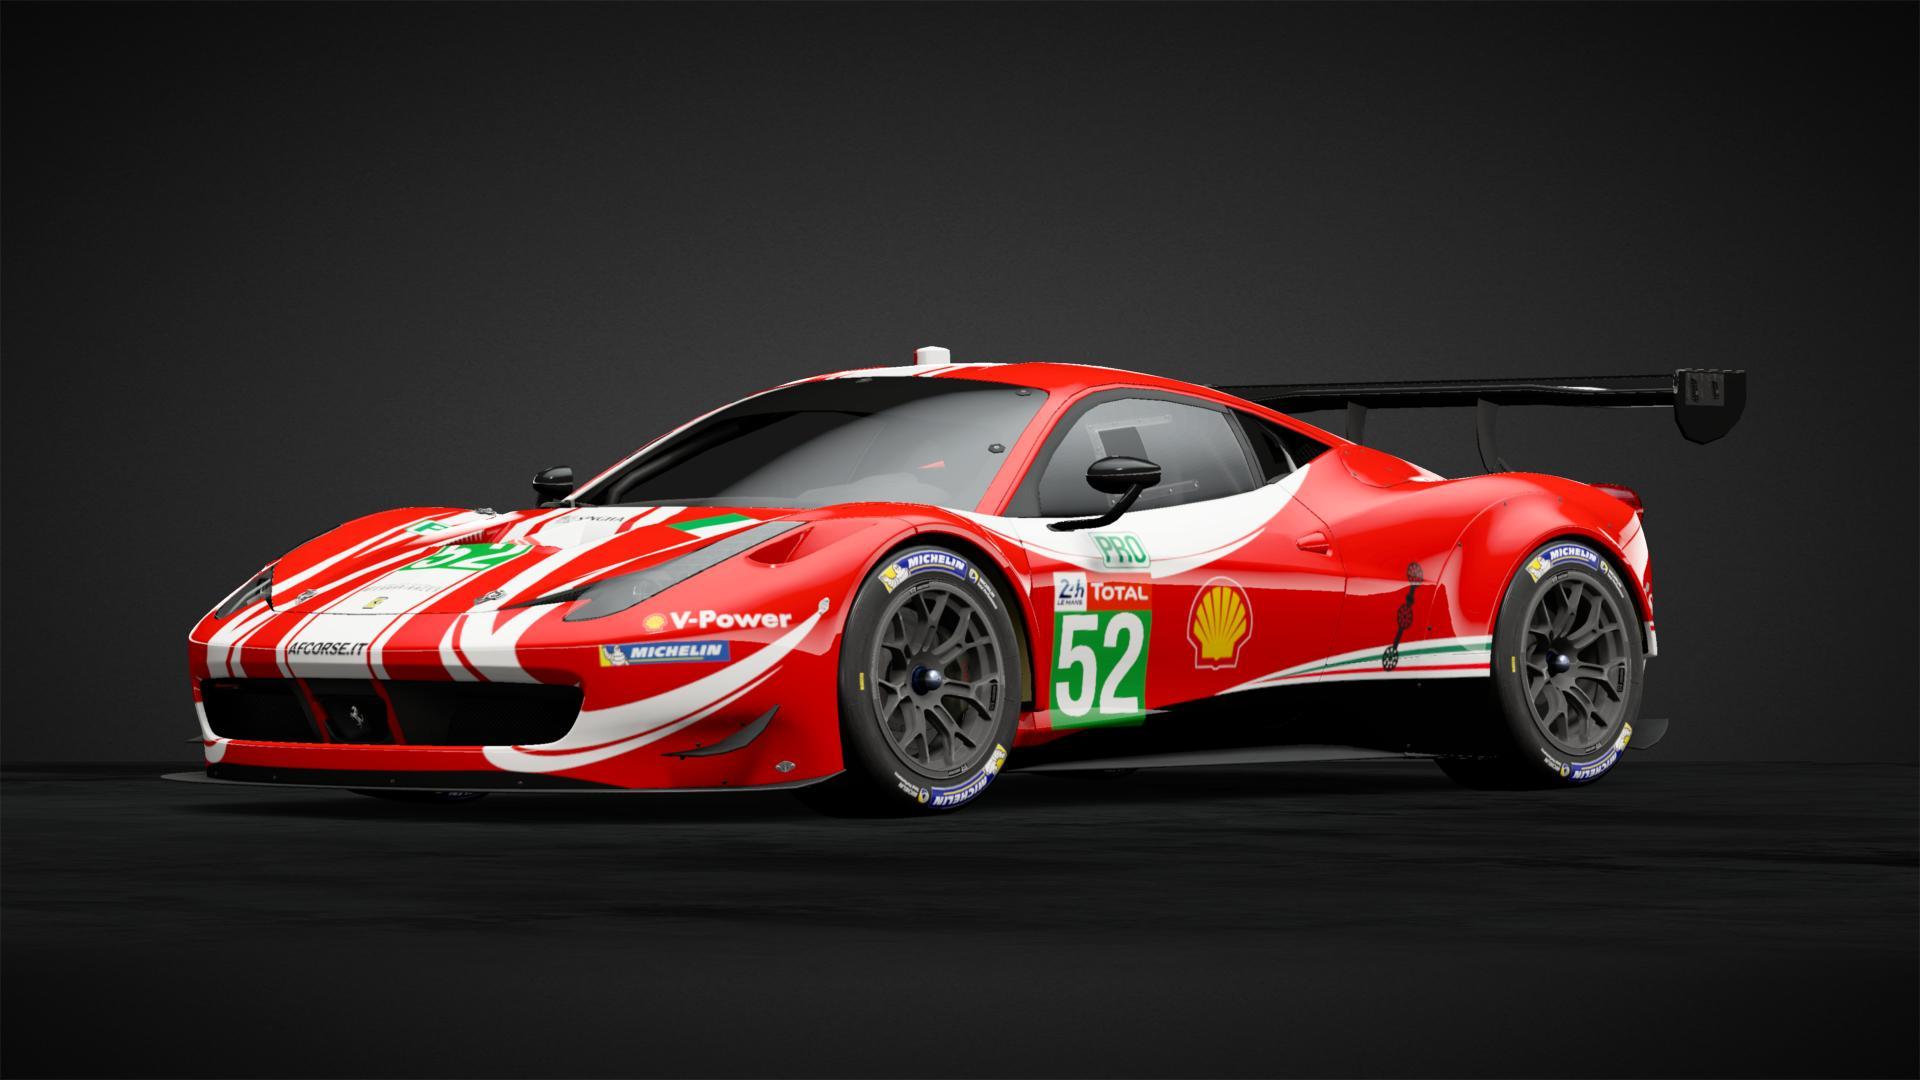 Ferrari 488 Gte Evo Af Corse 52 Car Livery By Speedchaserracin Community Gran Turismo Sport